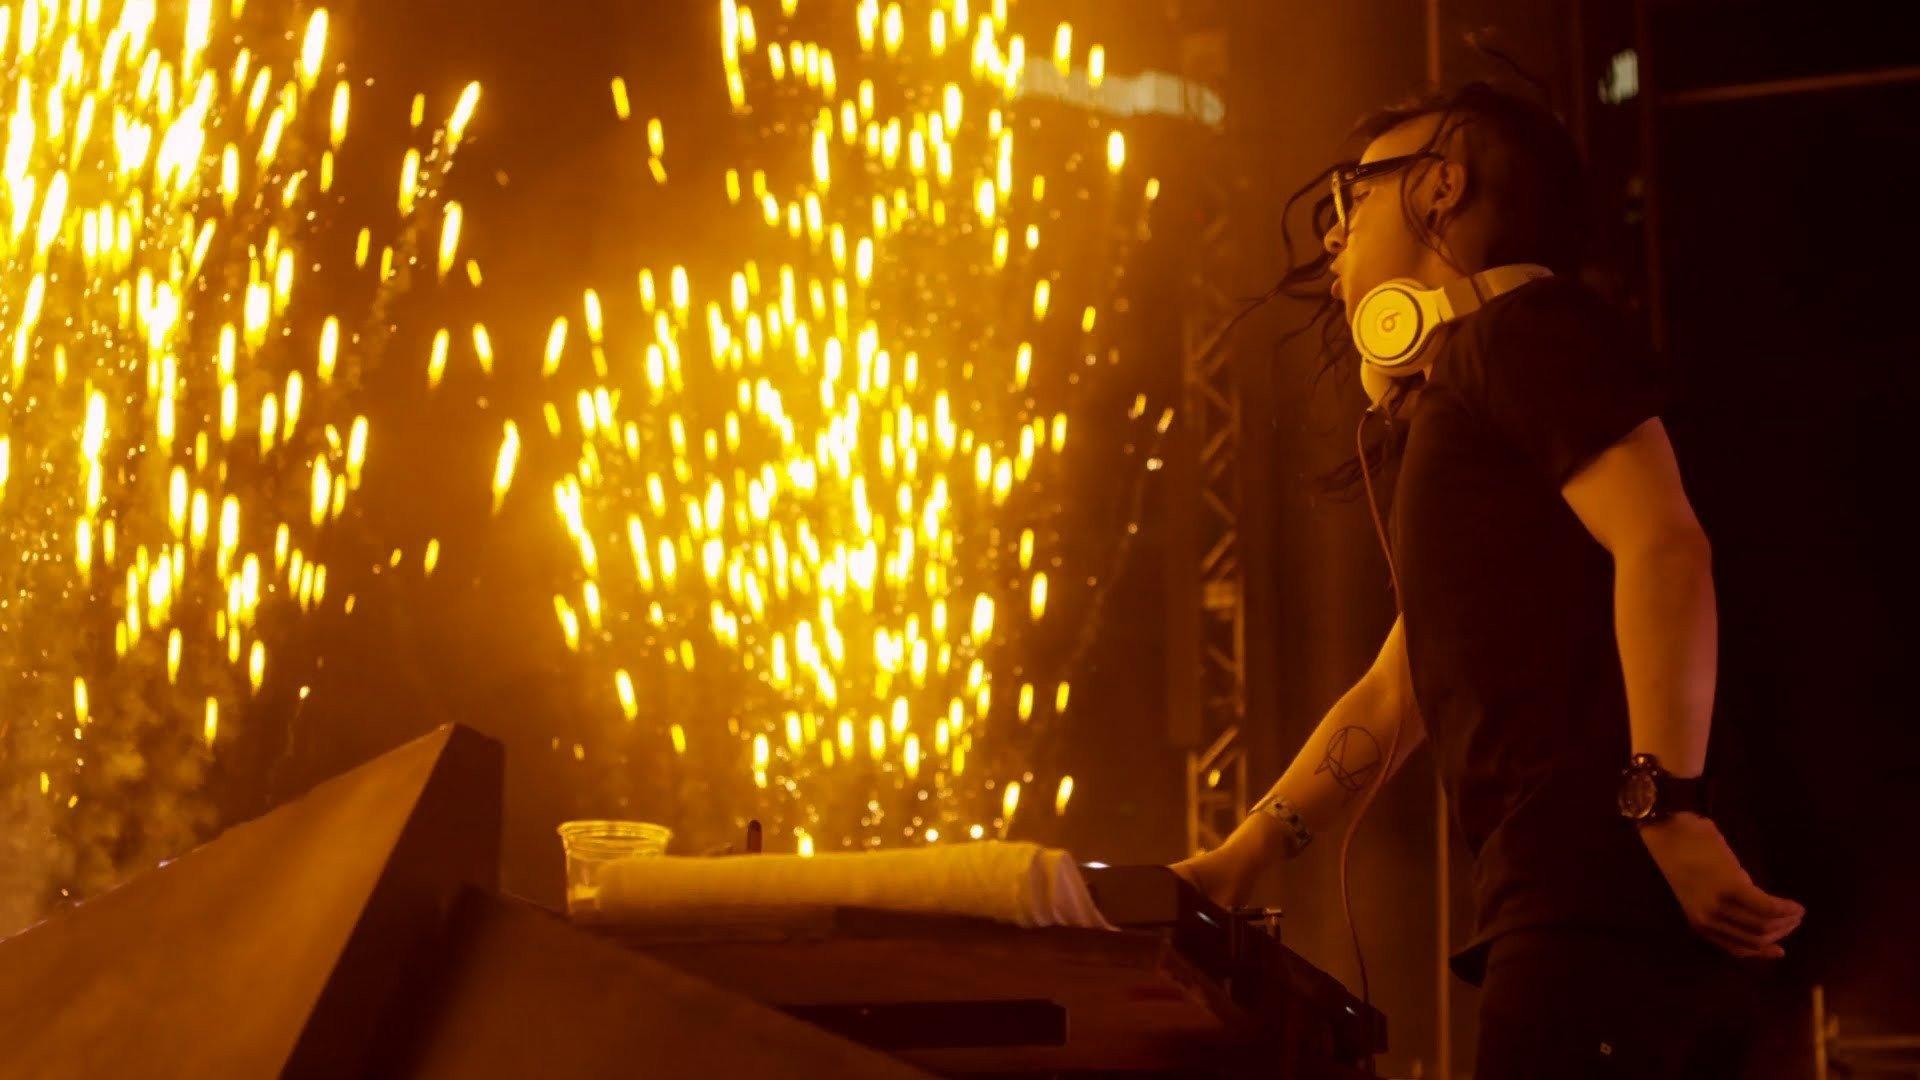 Download Ultra Music Festival Wallpaper Hd Gallery: Skrillex, Ultra Music Festival, DJ HD Wallpapers / Desktop